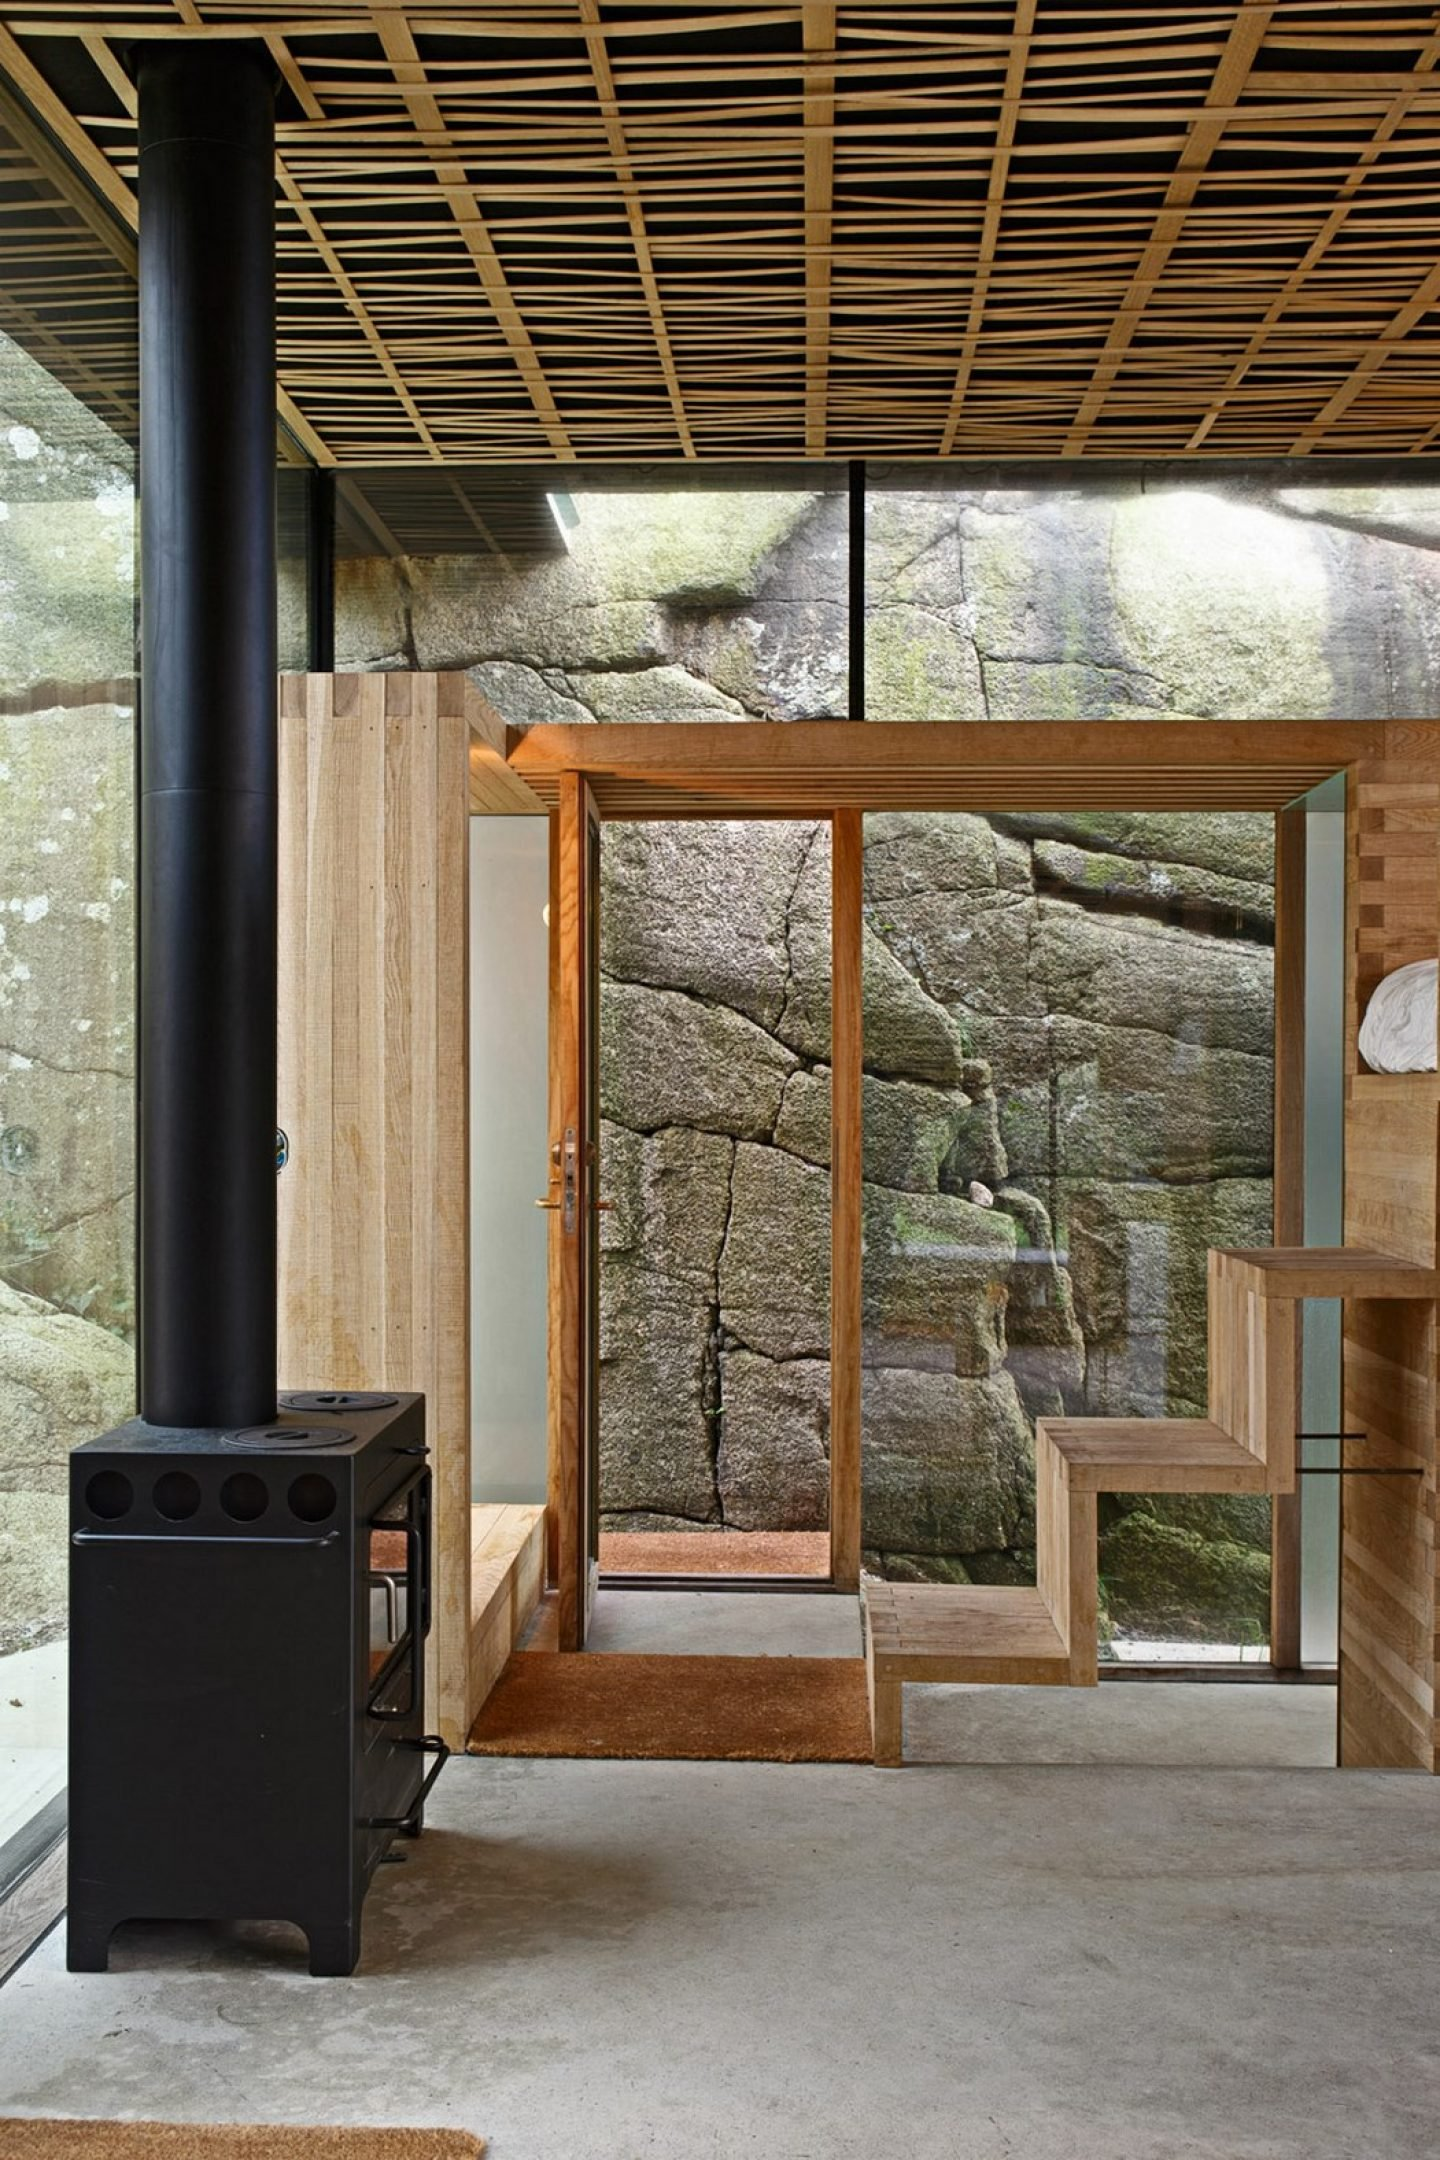 lund_hagem_architecture-16